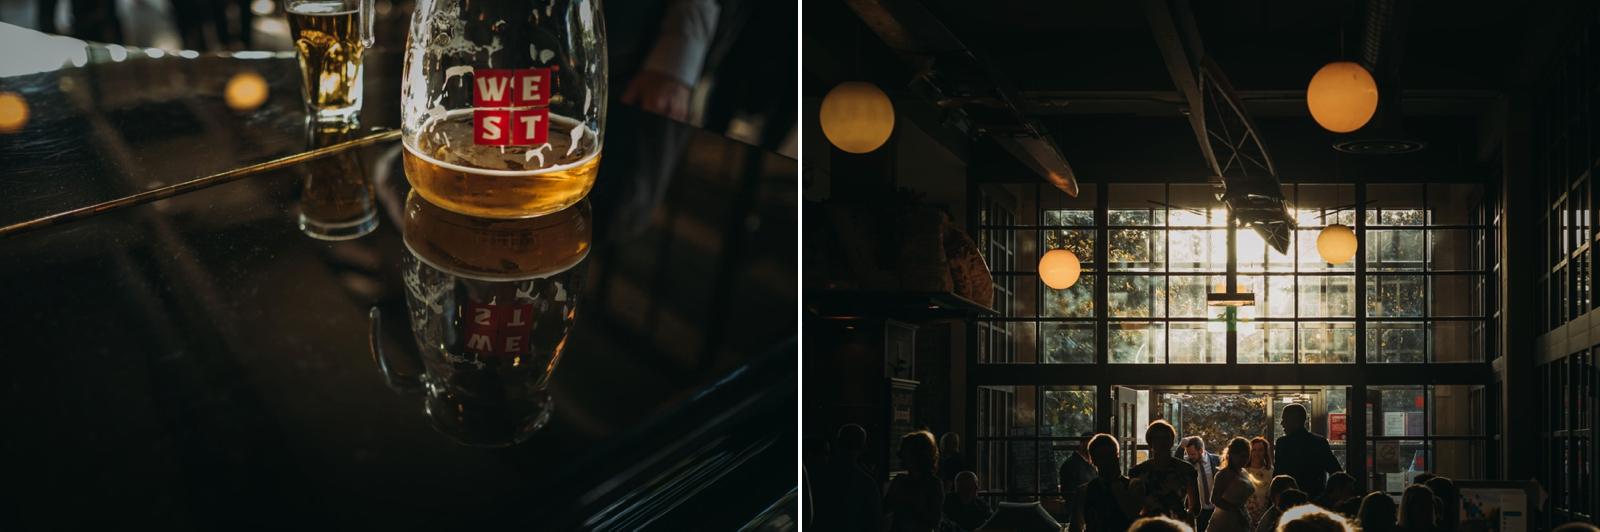 Gillian-Evan-West-Brewery-Jo-Donaldson-Photography-575.jpg